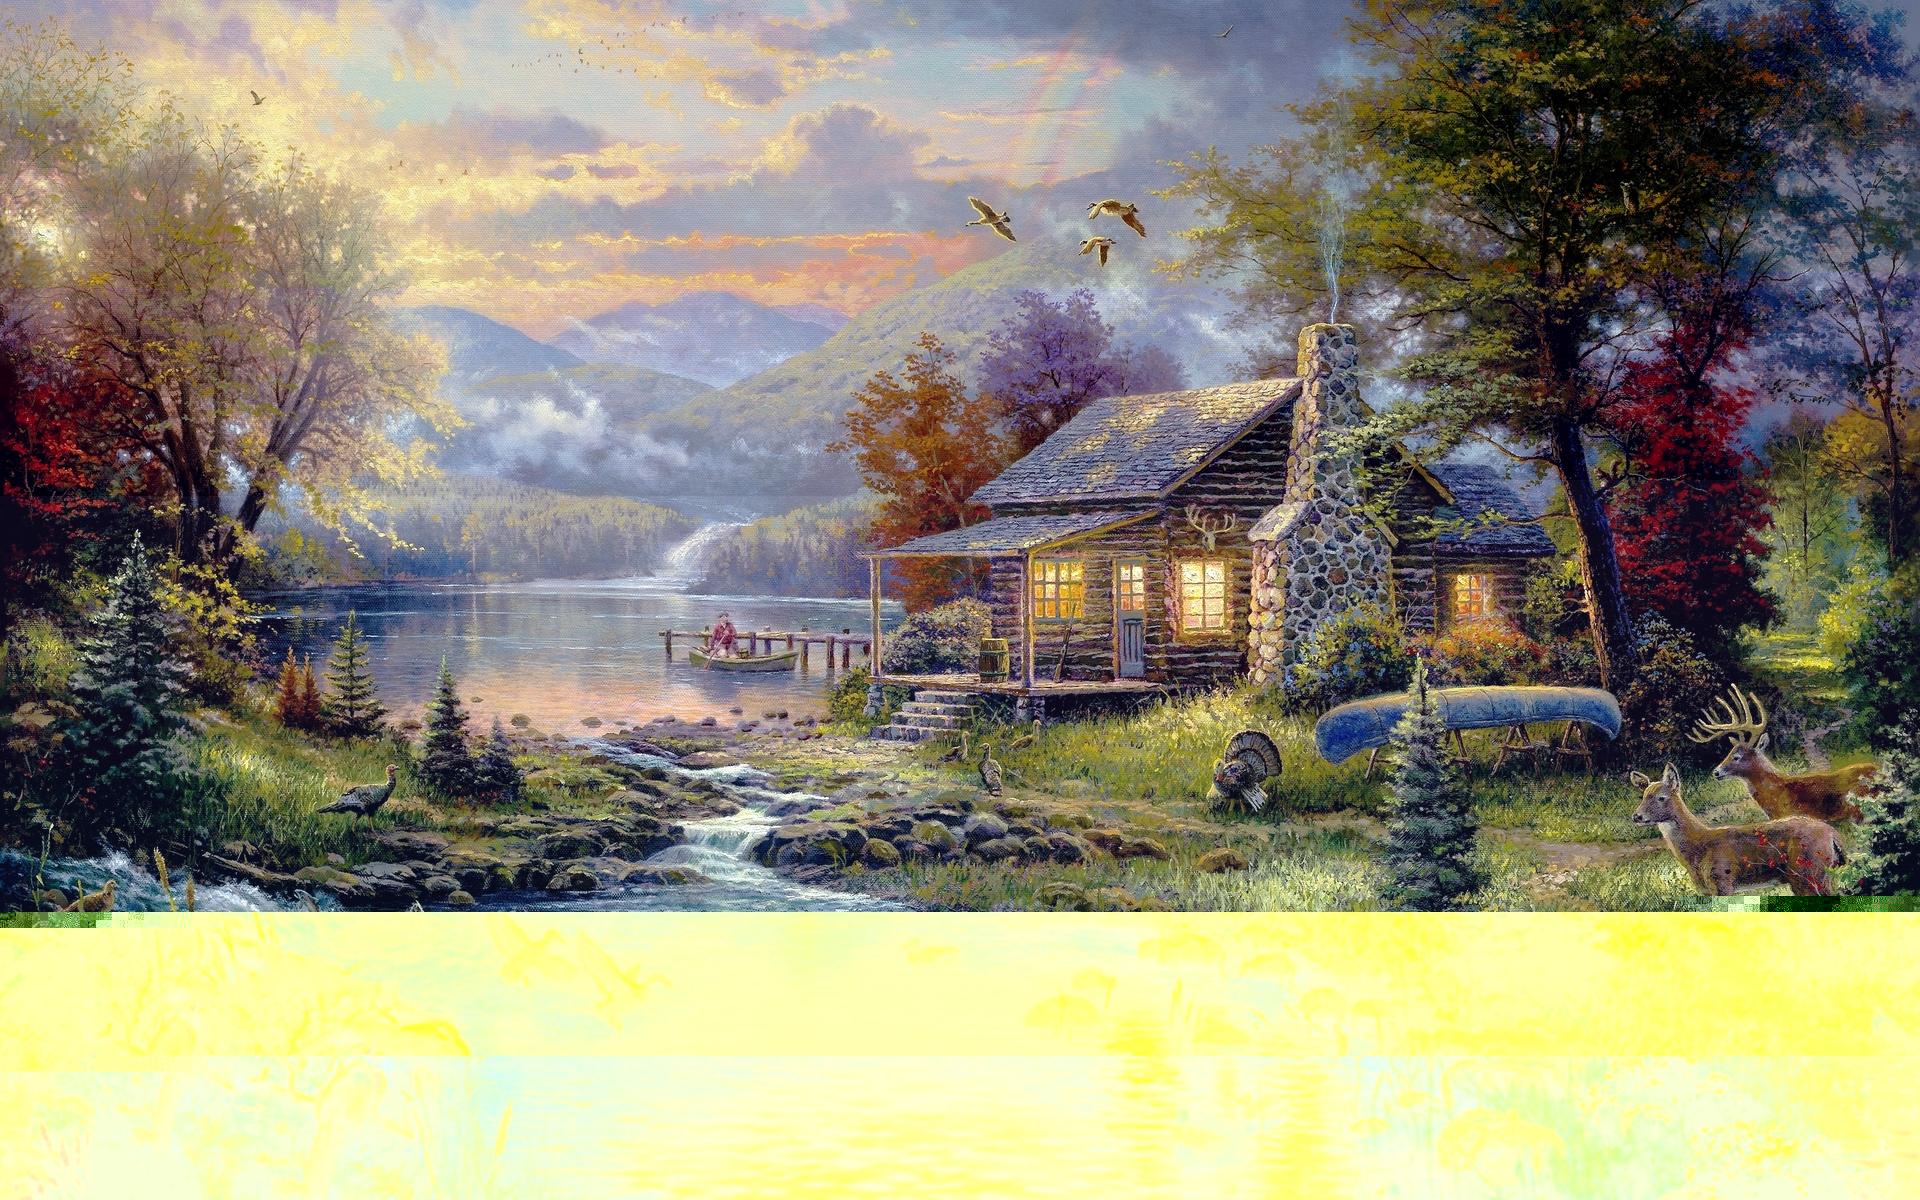 Country Wallpaper Hd Image Download Free Pixelstalk Net